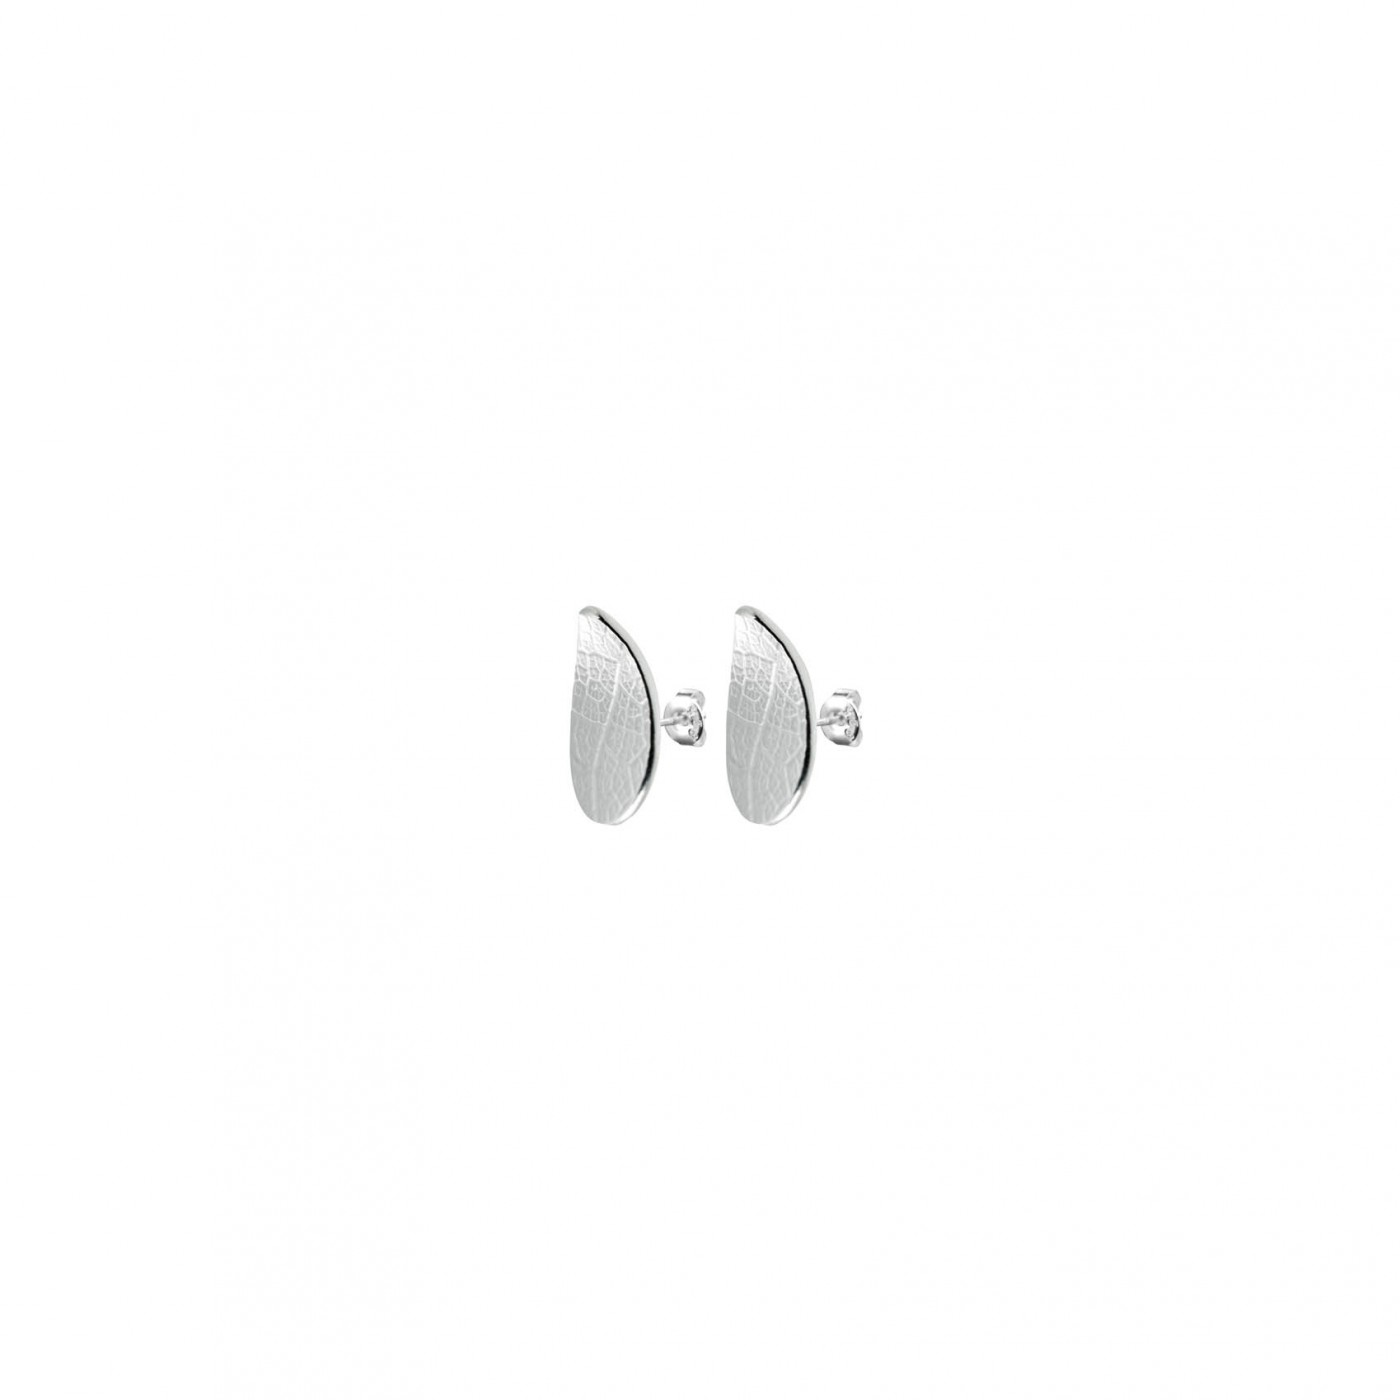 Leaf-drop-studs-fixed-1400x1400